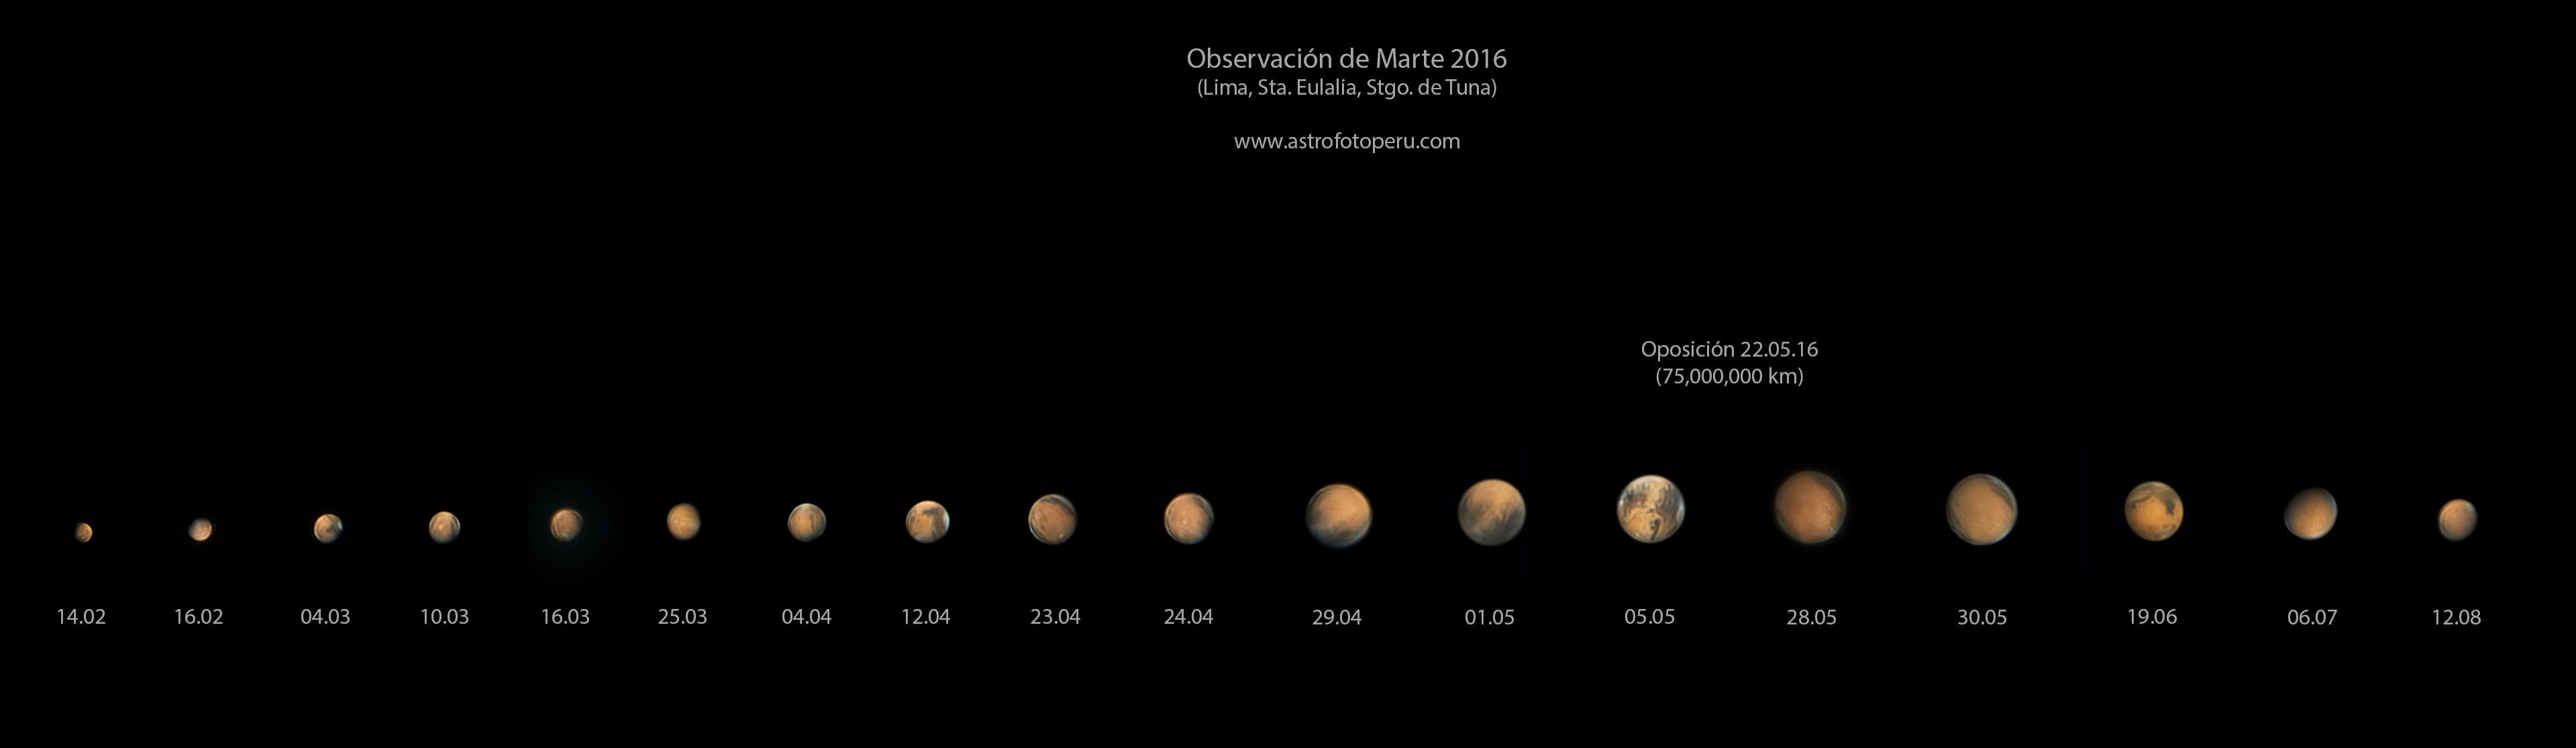 oposicion-de-marte-2016-astrofotoperu